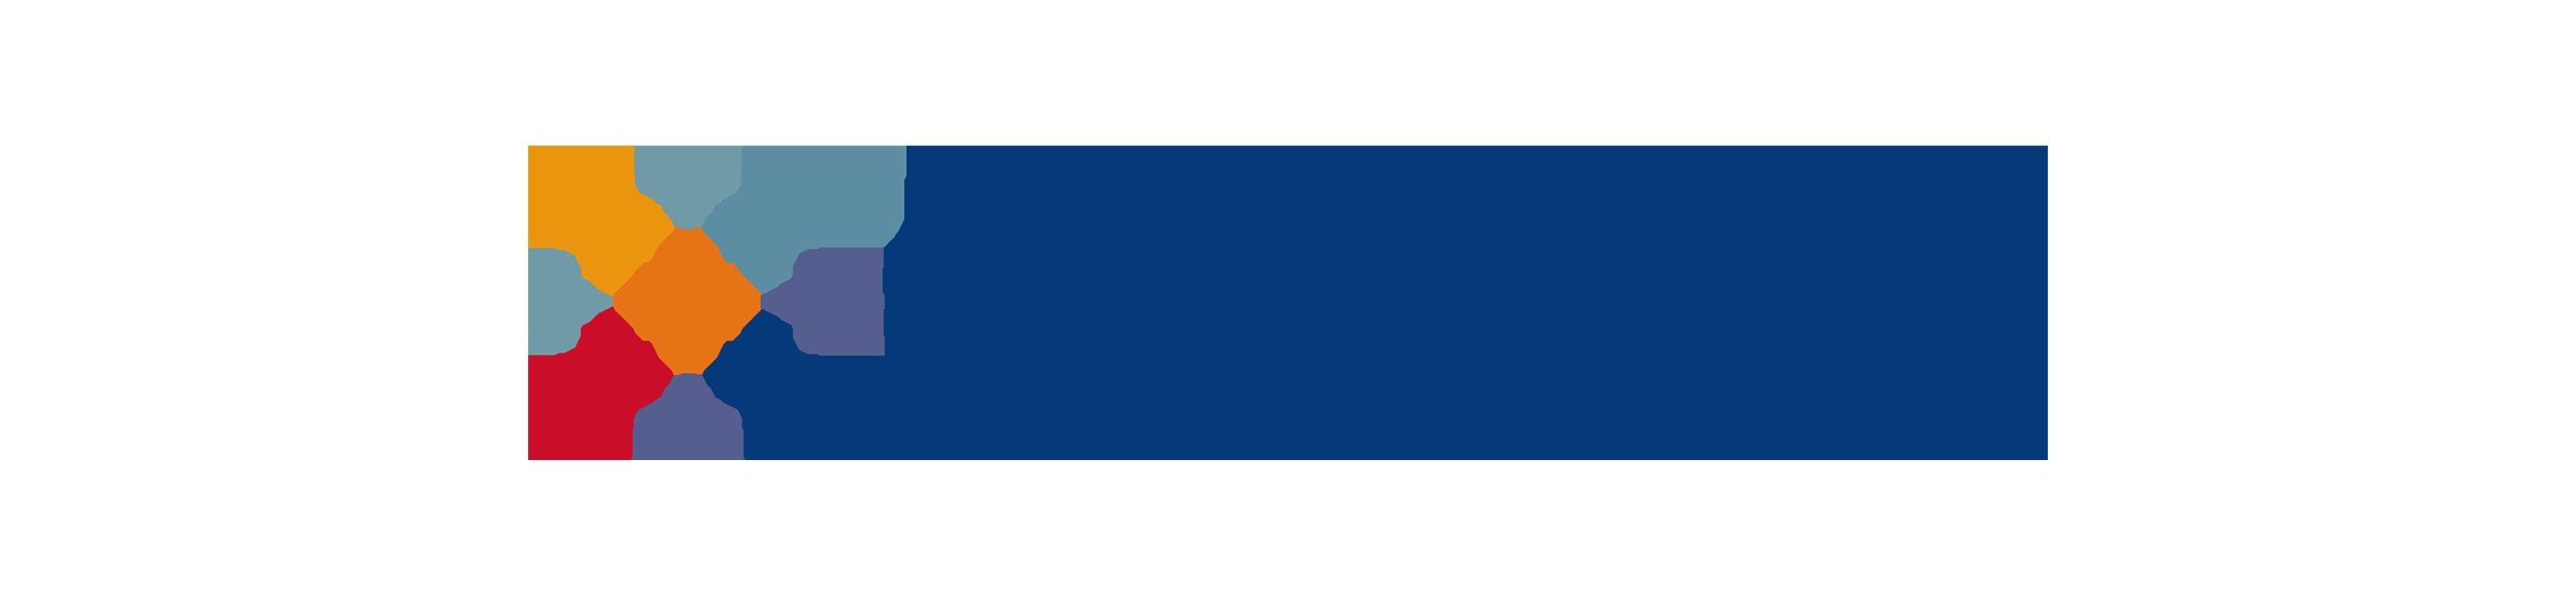 Tableau Software